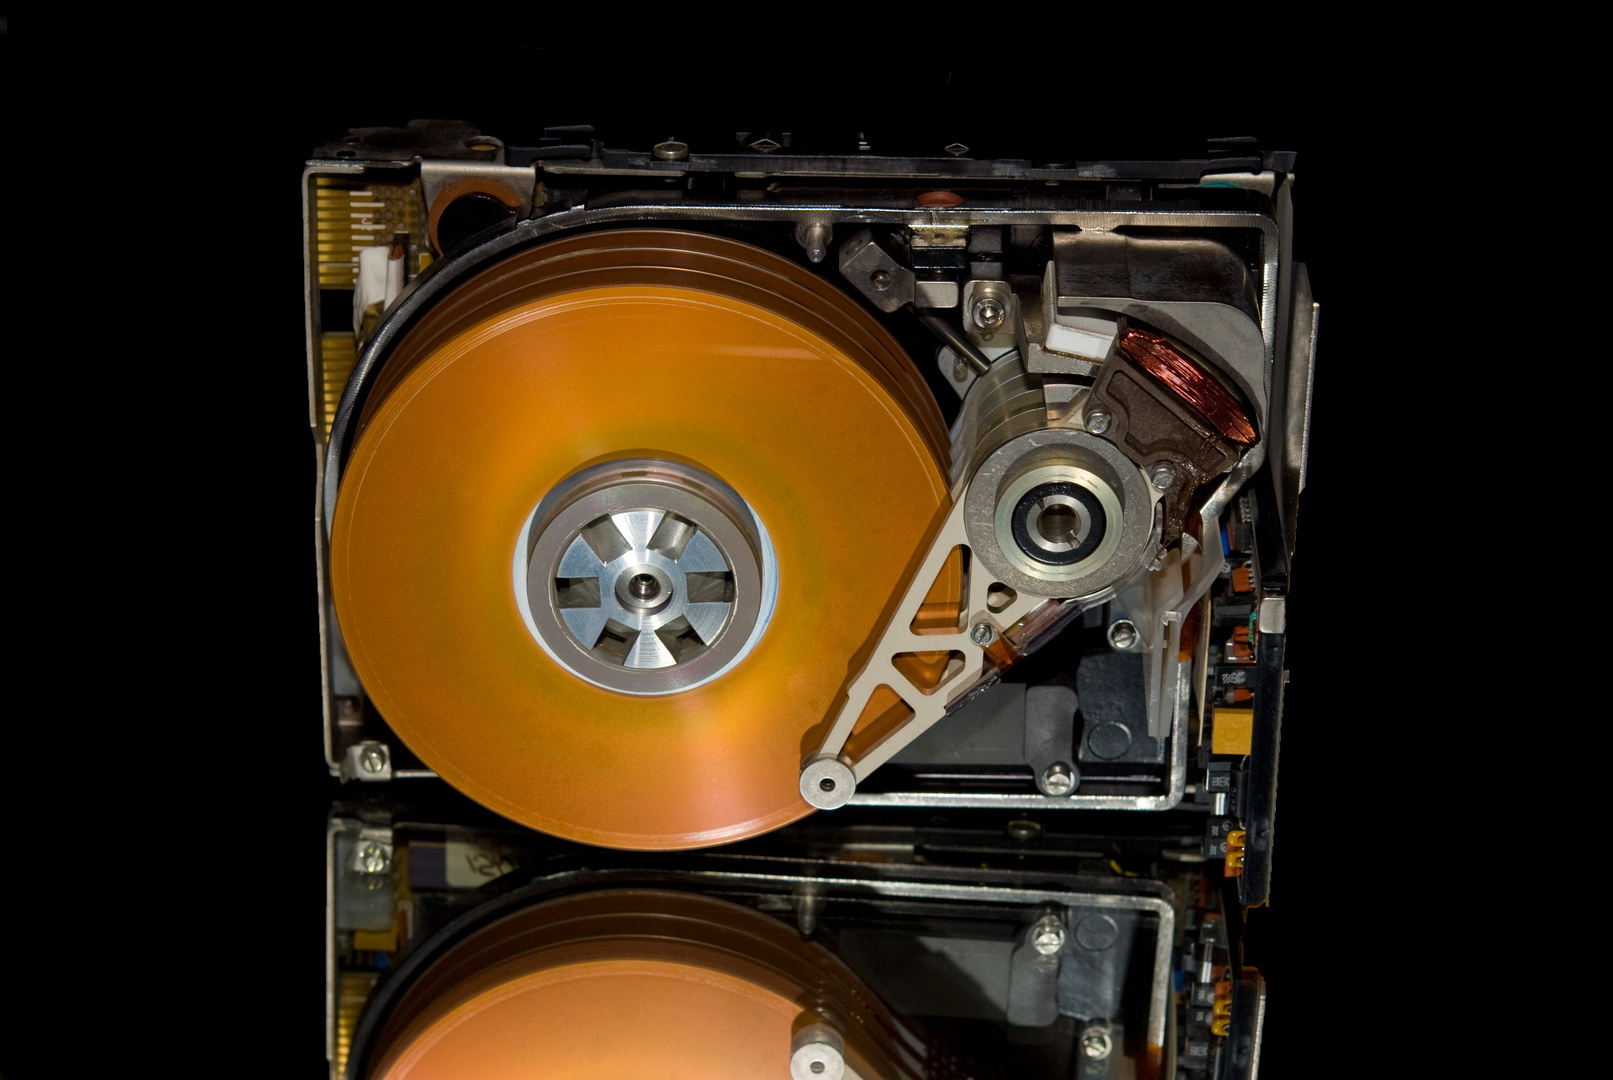 Festplatte ca. 10 MB, 3,5 kg schwer